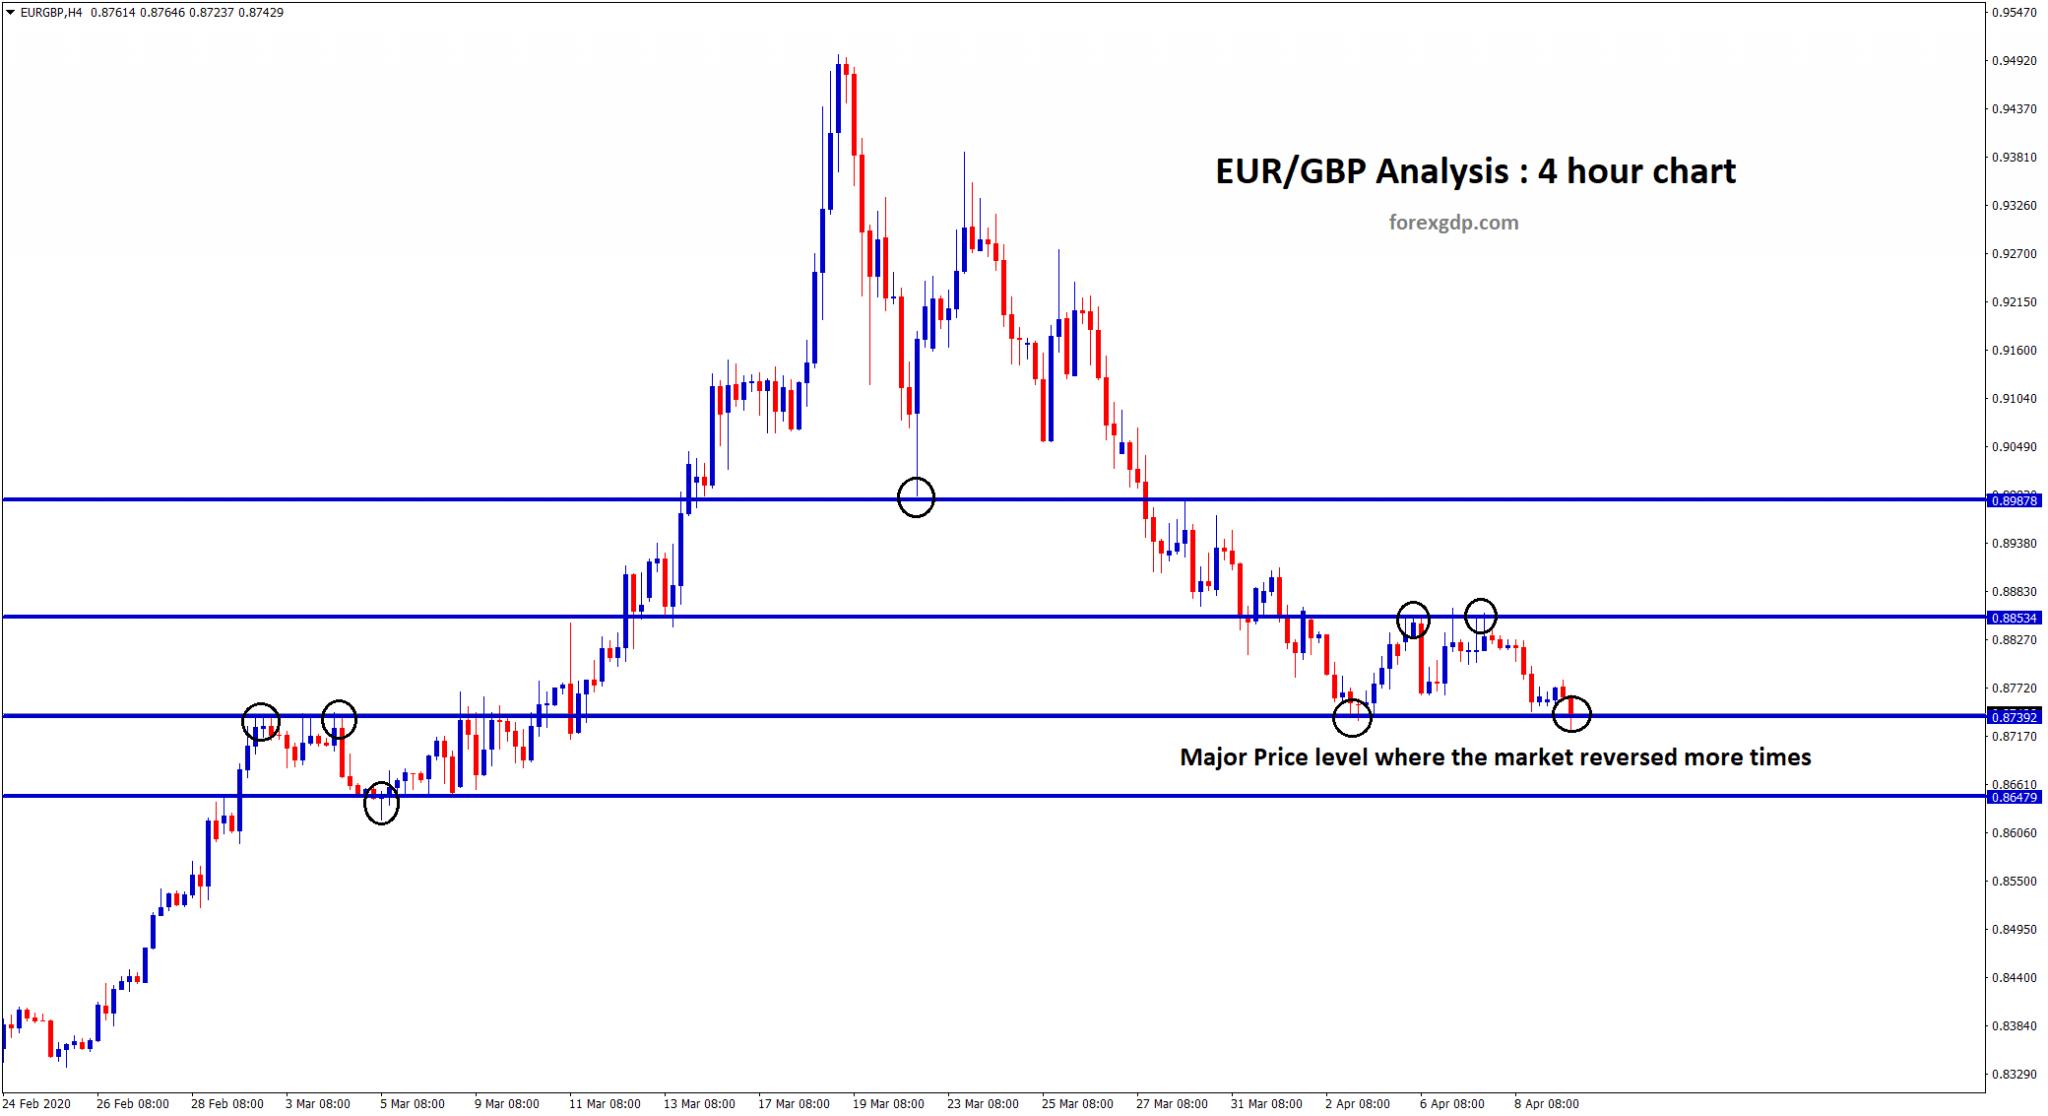 Major price level where EUR GBP reversed more times